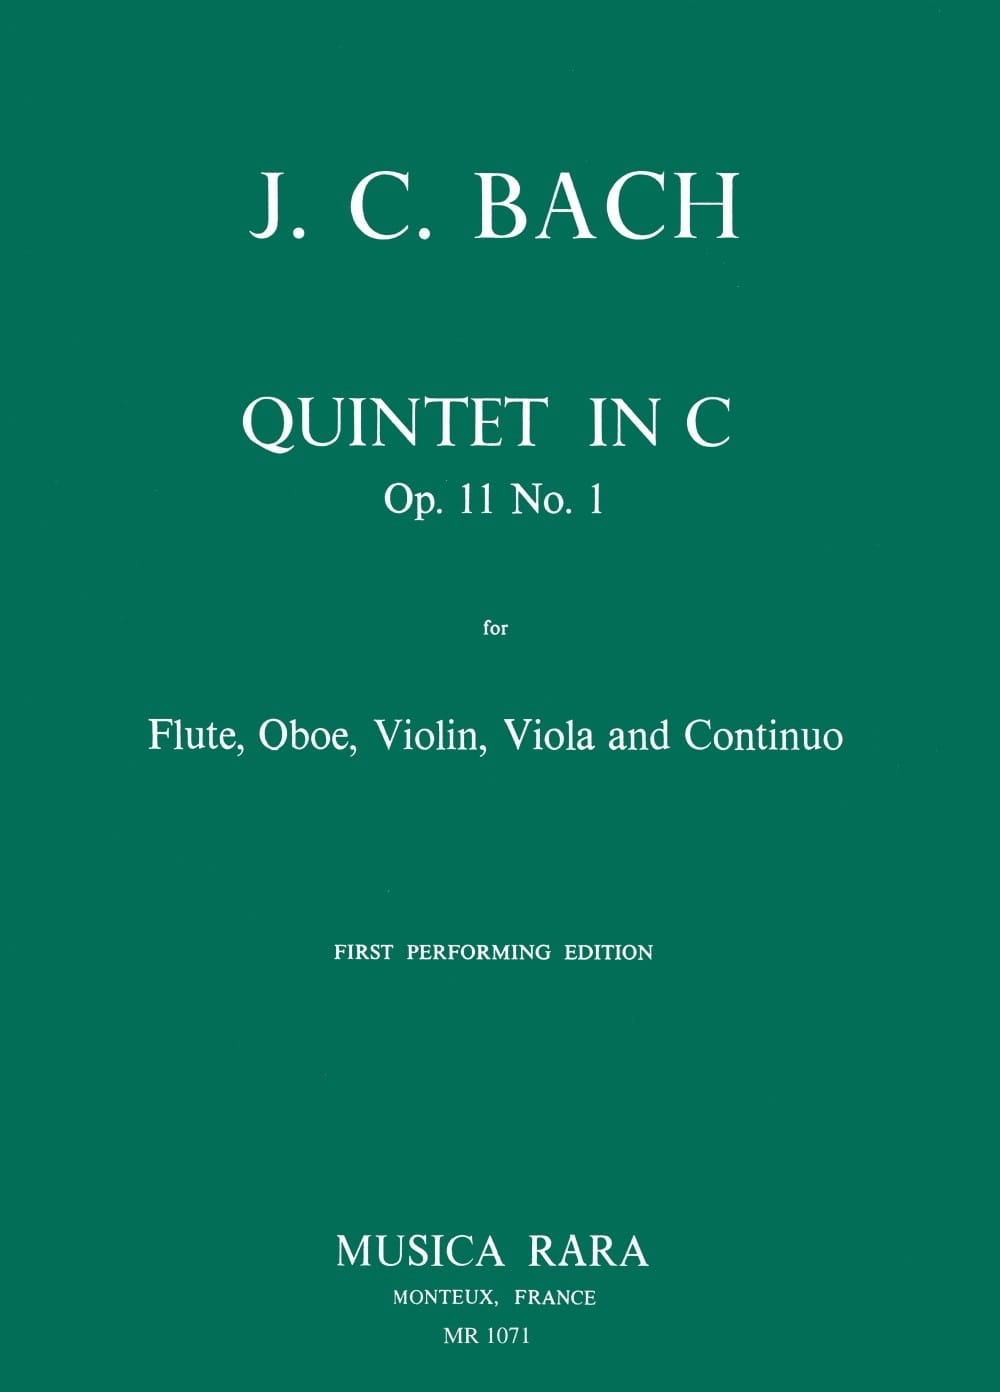 Quintet in C op. 11 n° 1 -Flute oboe violin viola Bc - laflutedepan.com